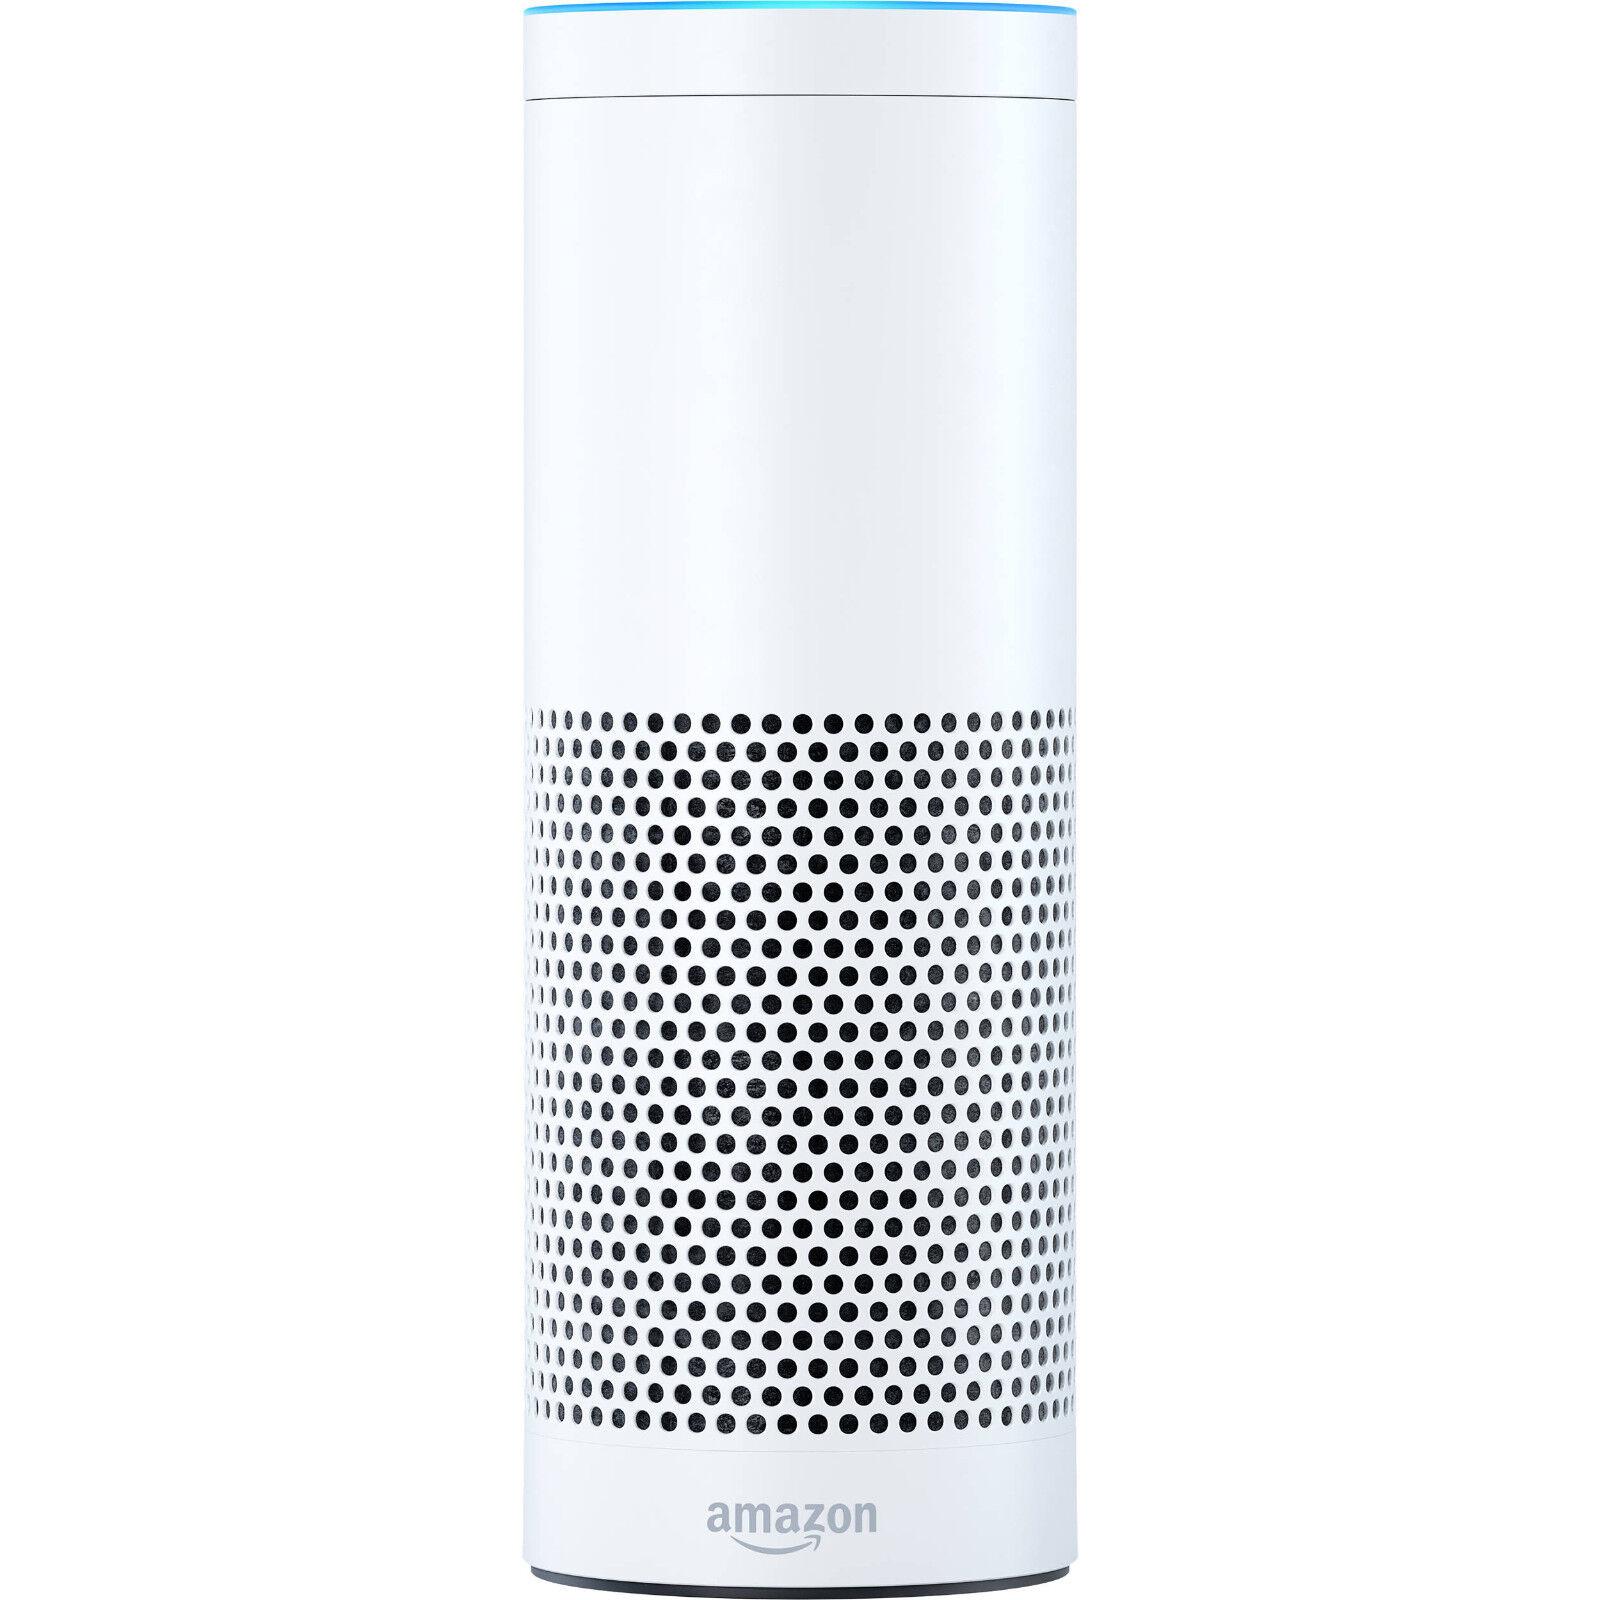 Amazon Echo w  Alexa Voice Control Personal Assistant & blueetooth Speaker, White